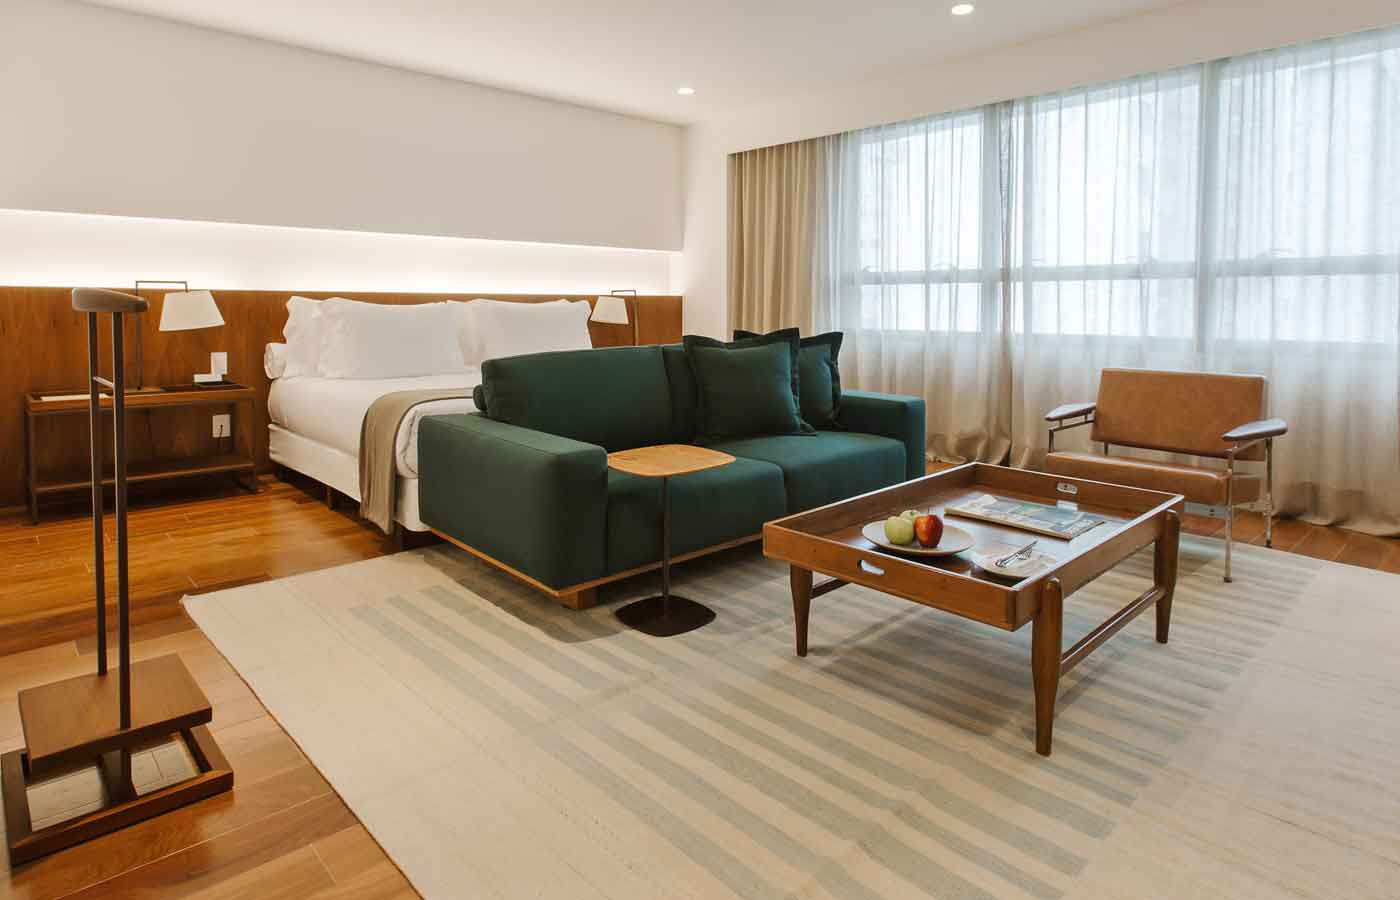 Hotel Fasano Belo Horizonte in Brazil - contemporary bedroom